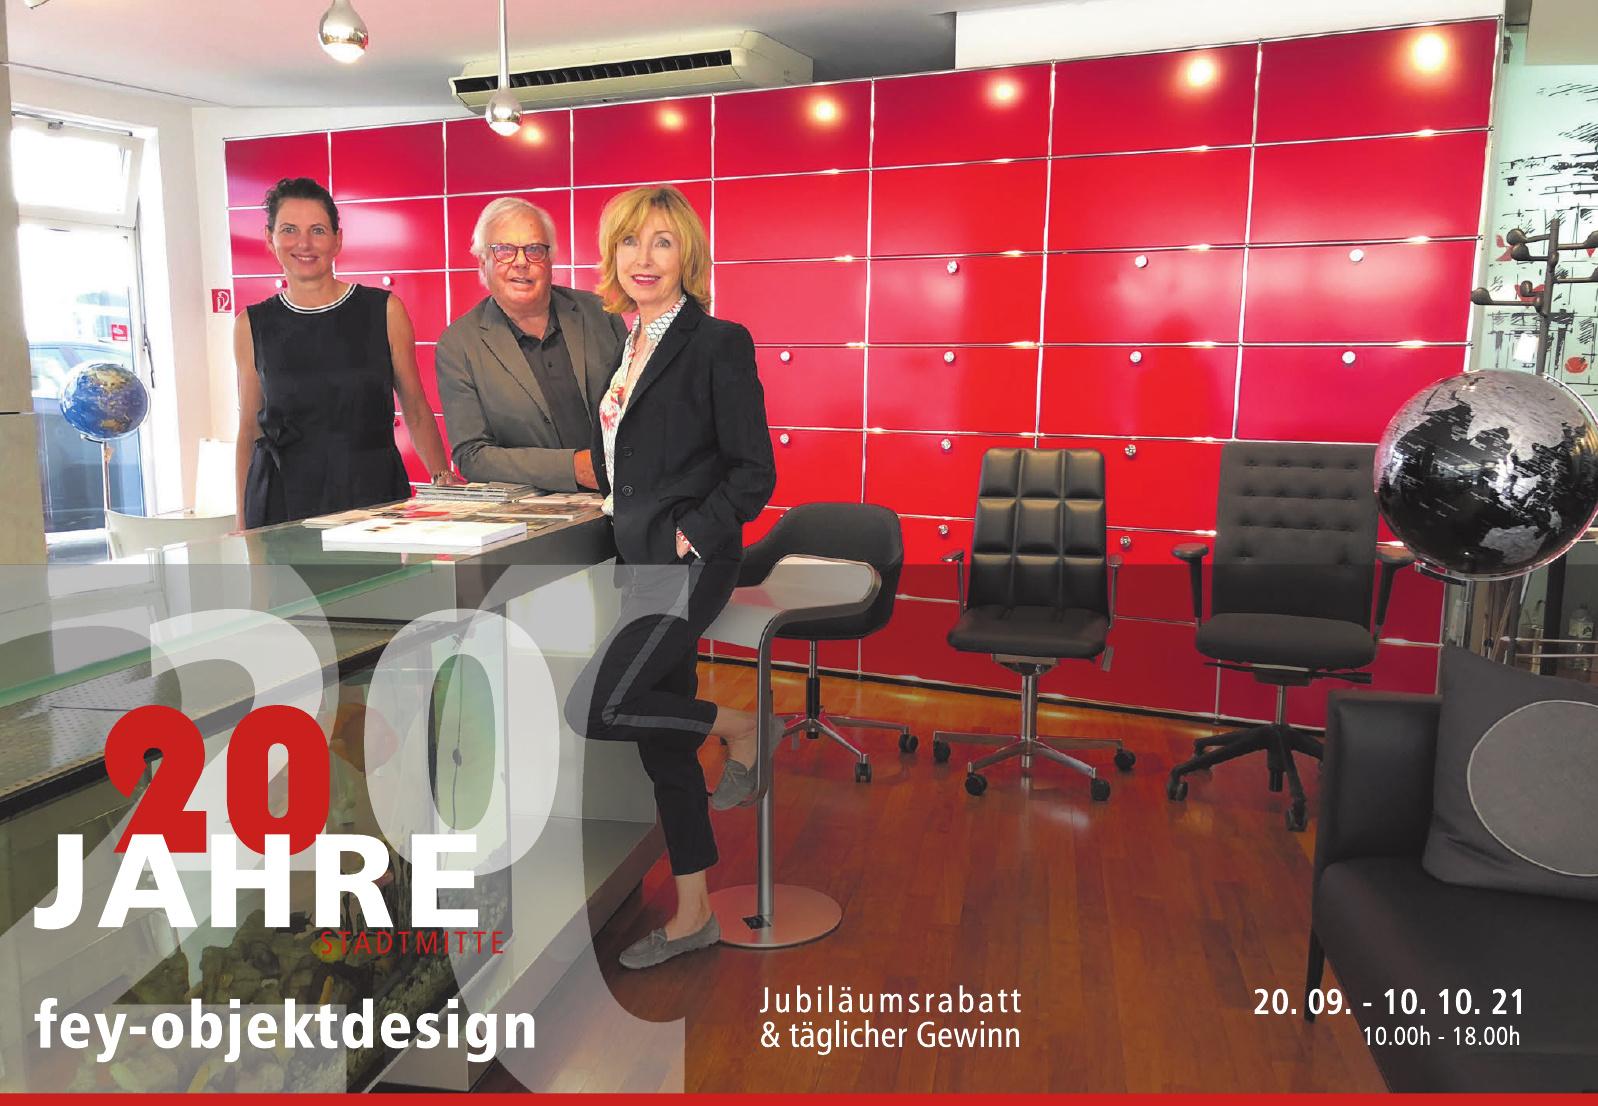 fey messe & objektdesign GmbH & Co.KG